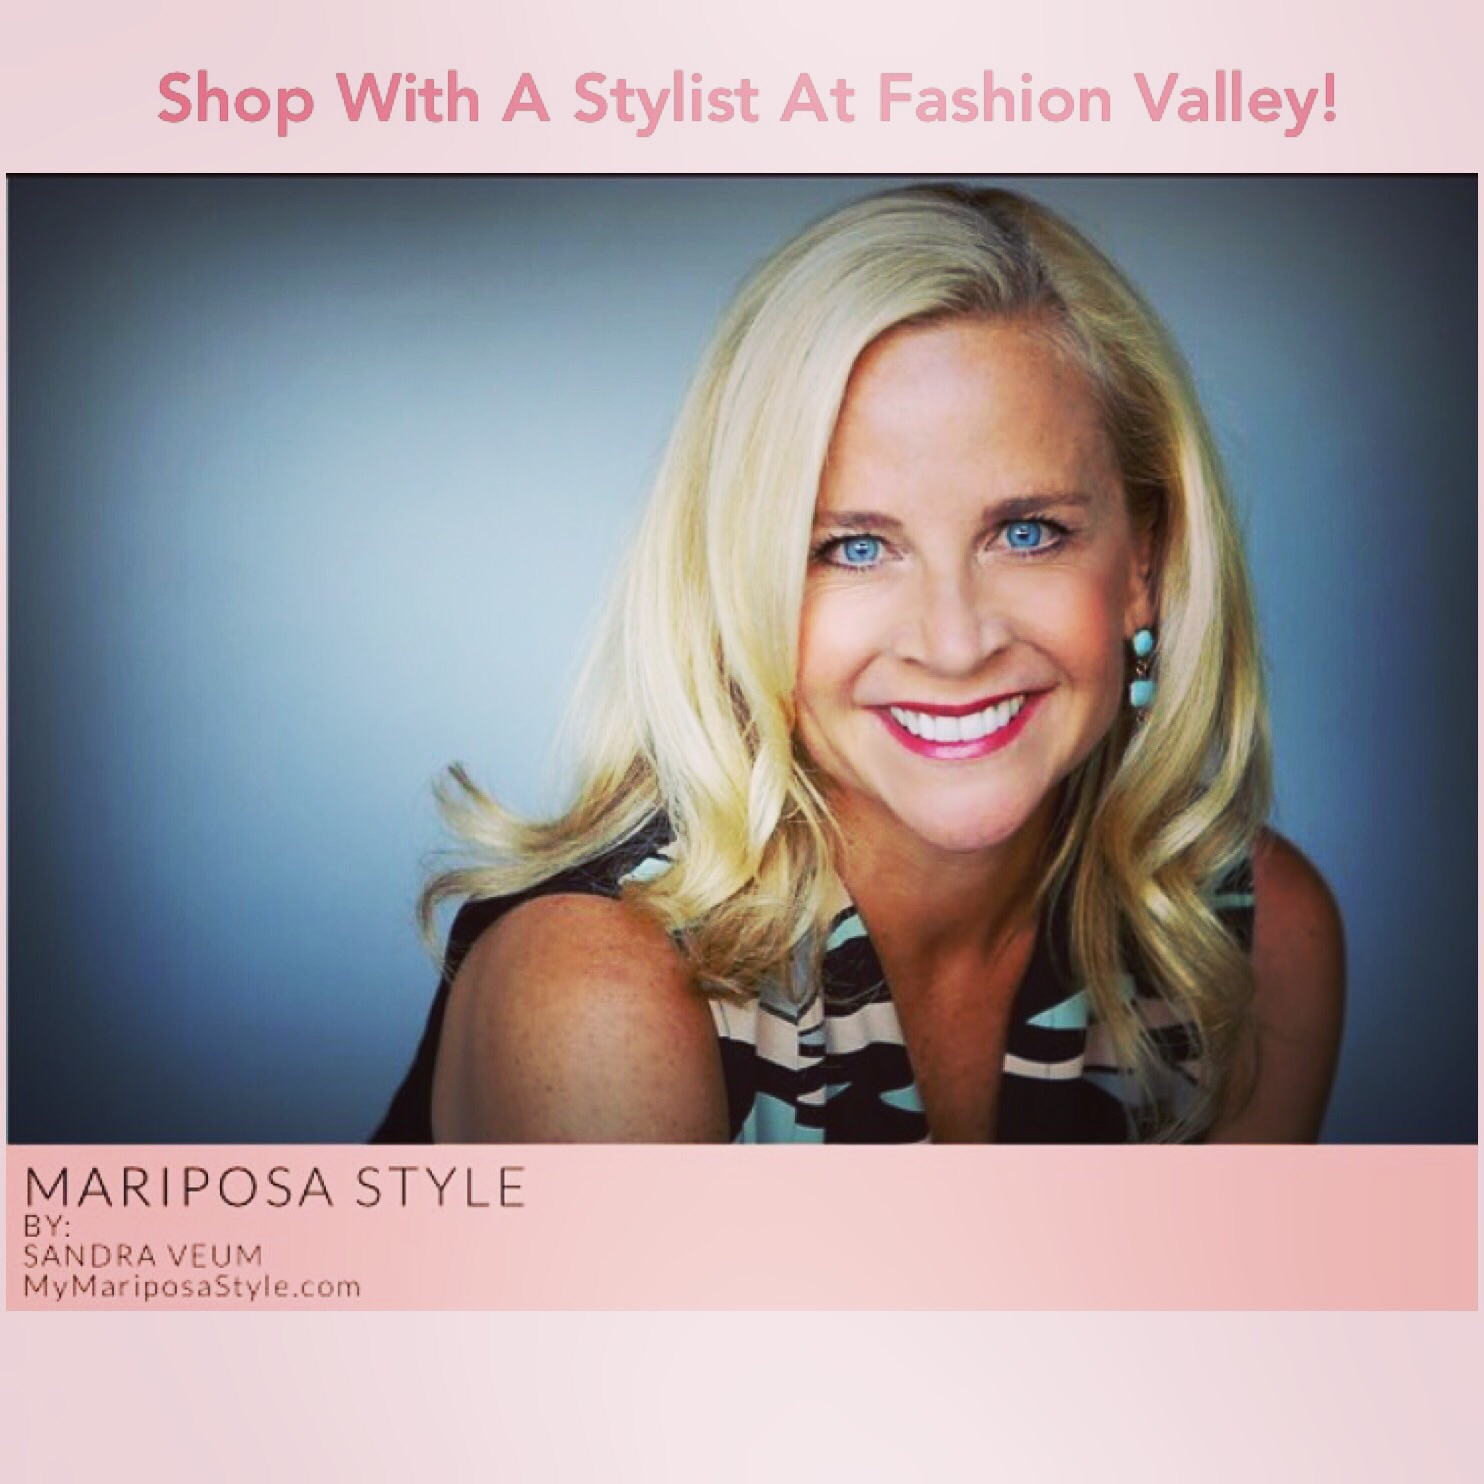 Sandra Veum, Personal Wardrobe Stylist